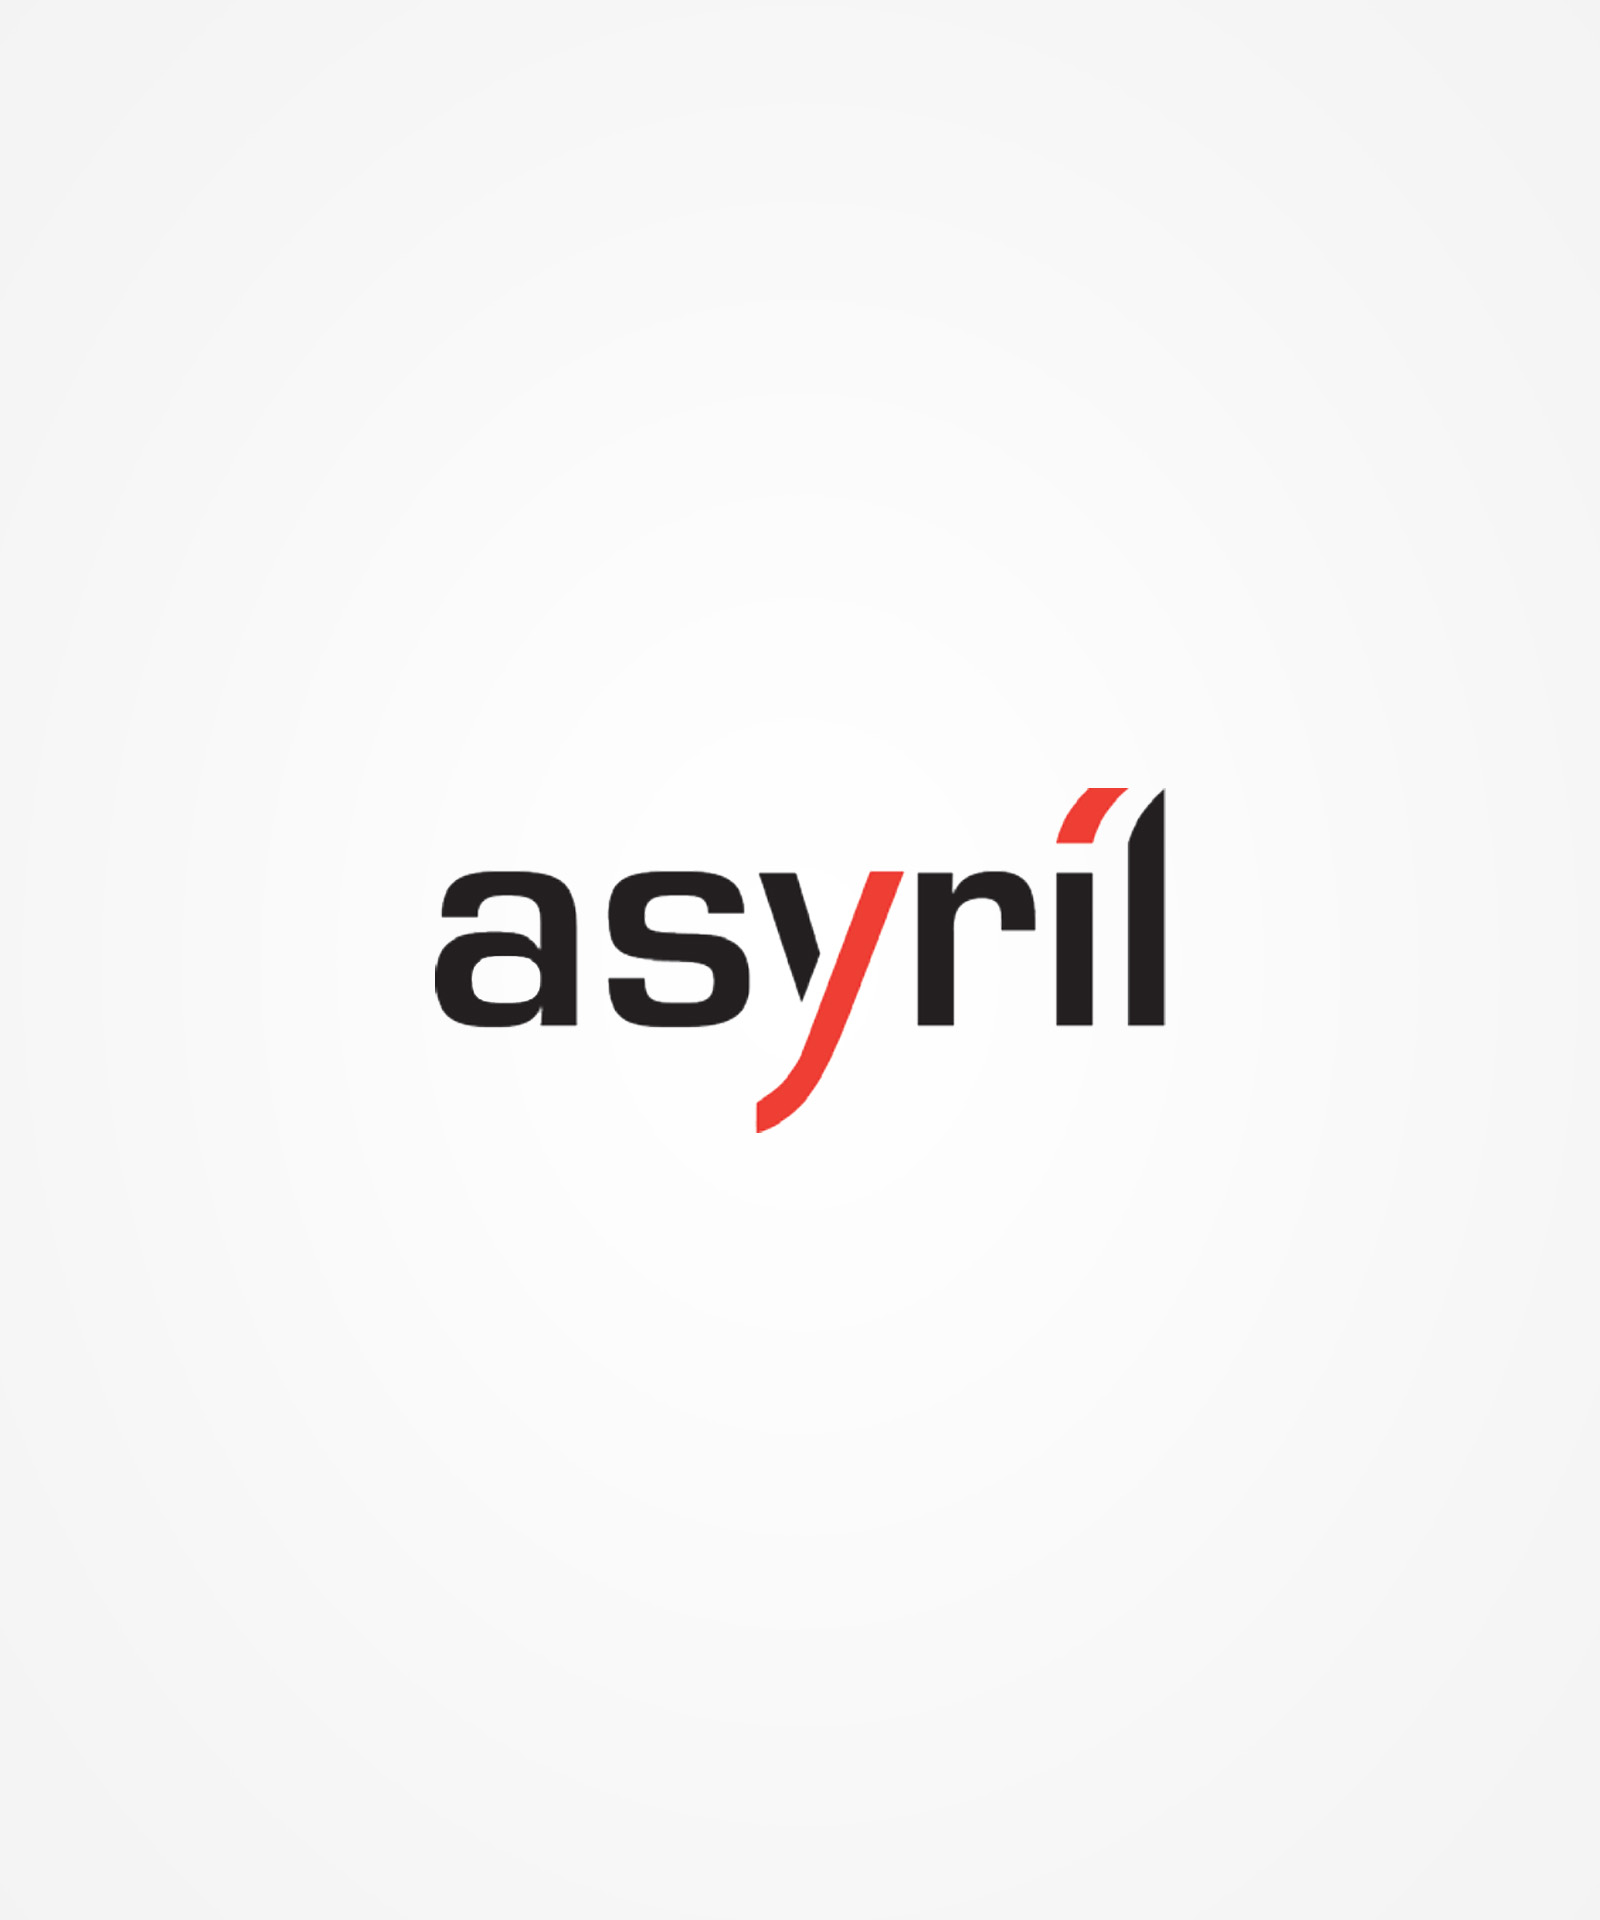 Asyril